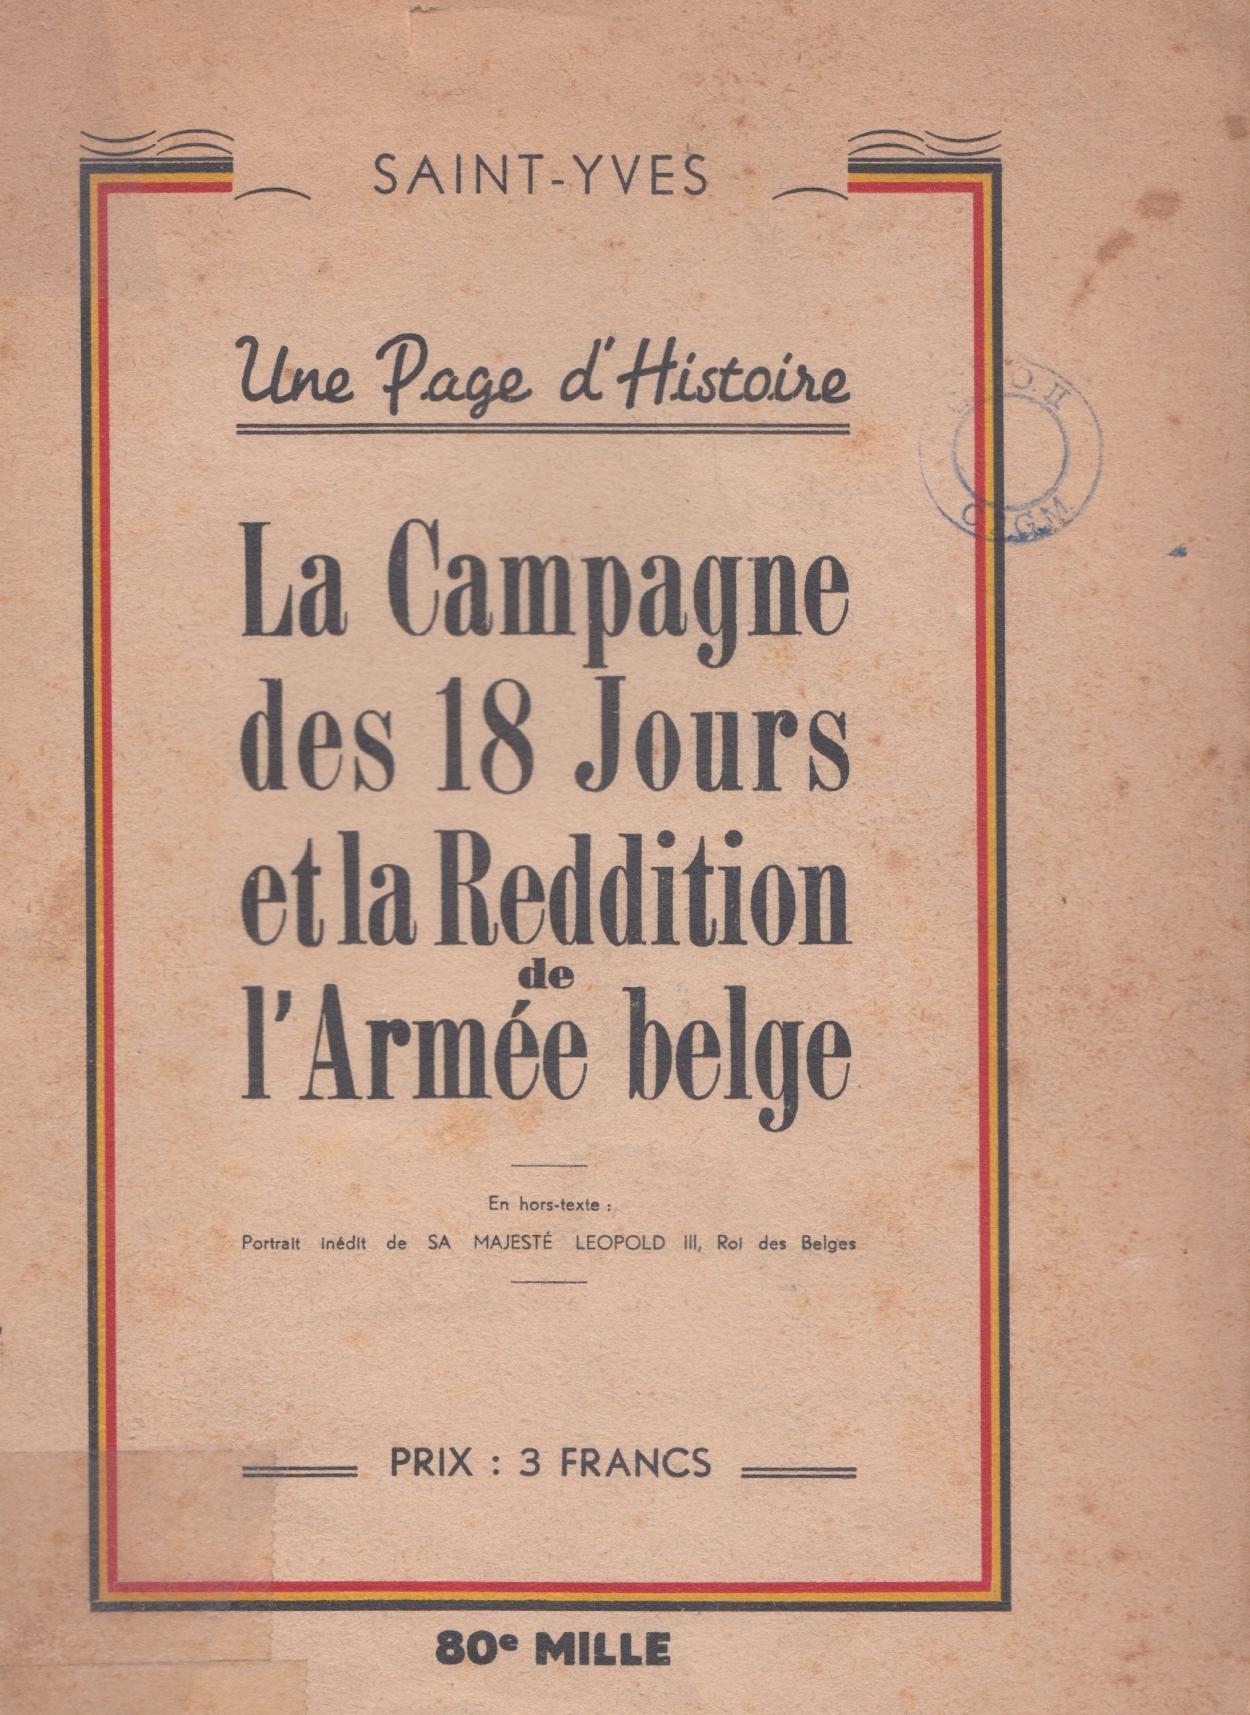 belvirmus_PAUL STRUYL_Campagne 18 jours 1